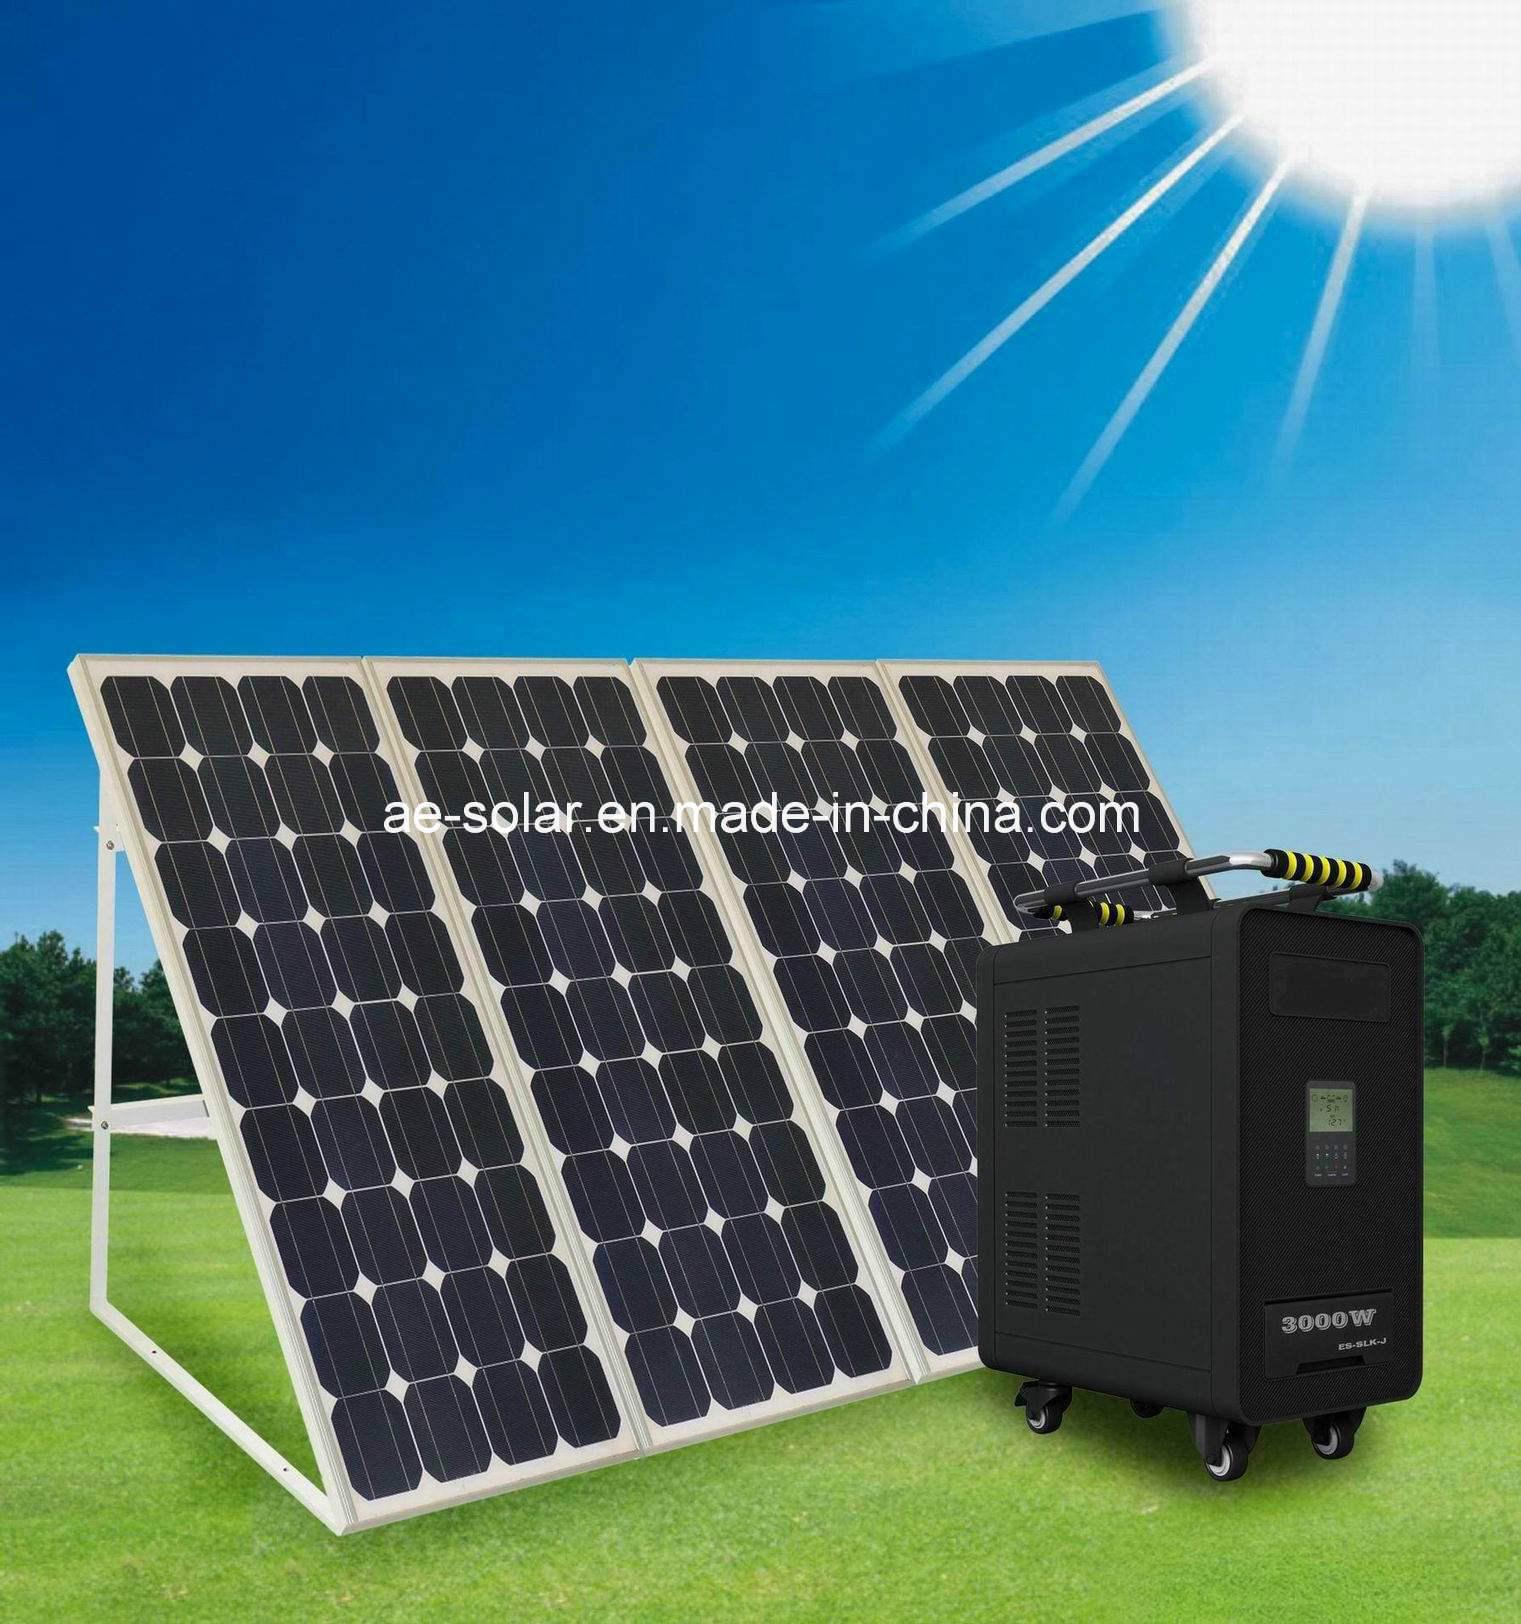 China Home Use Portable Solar Generator 1kw China Solar